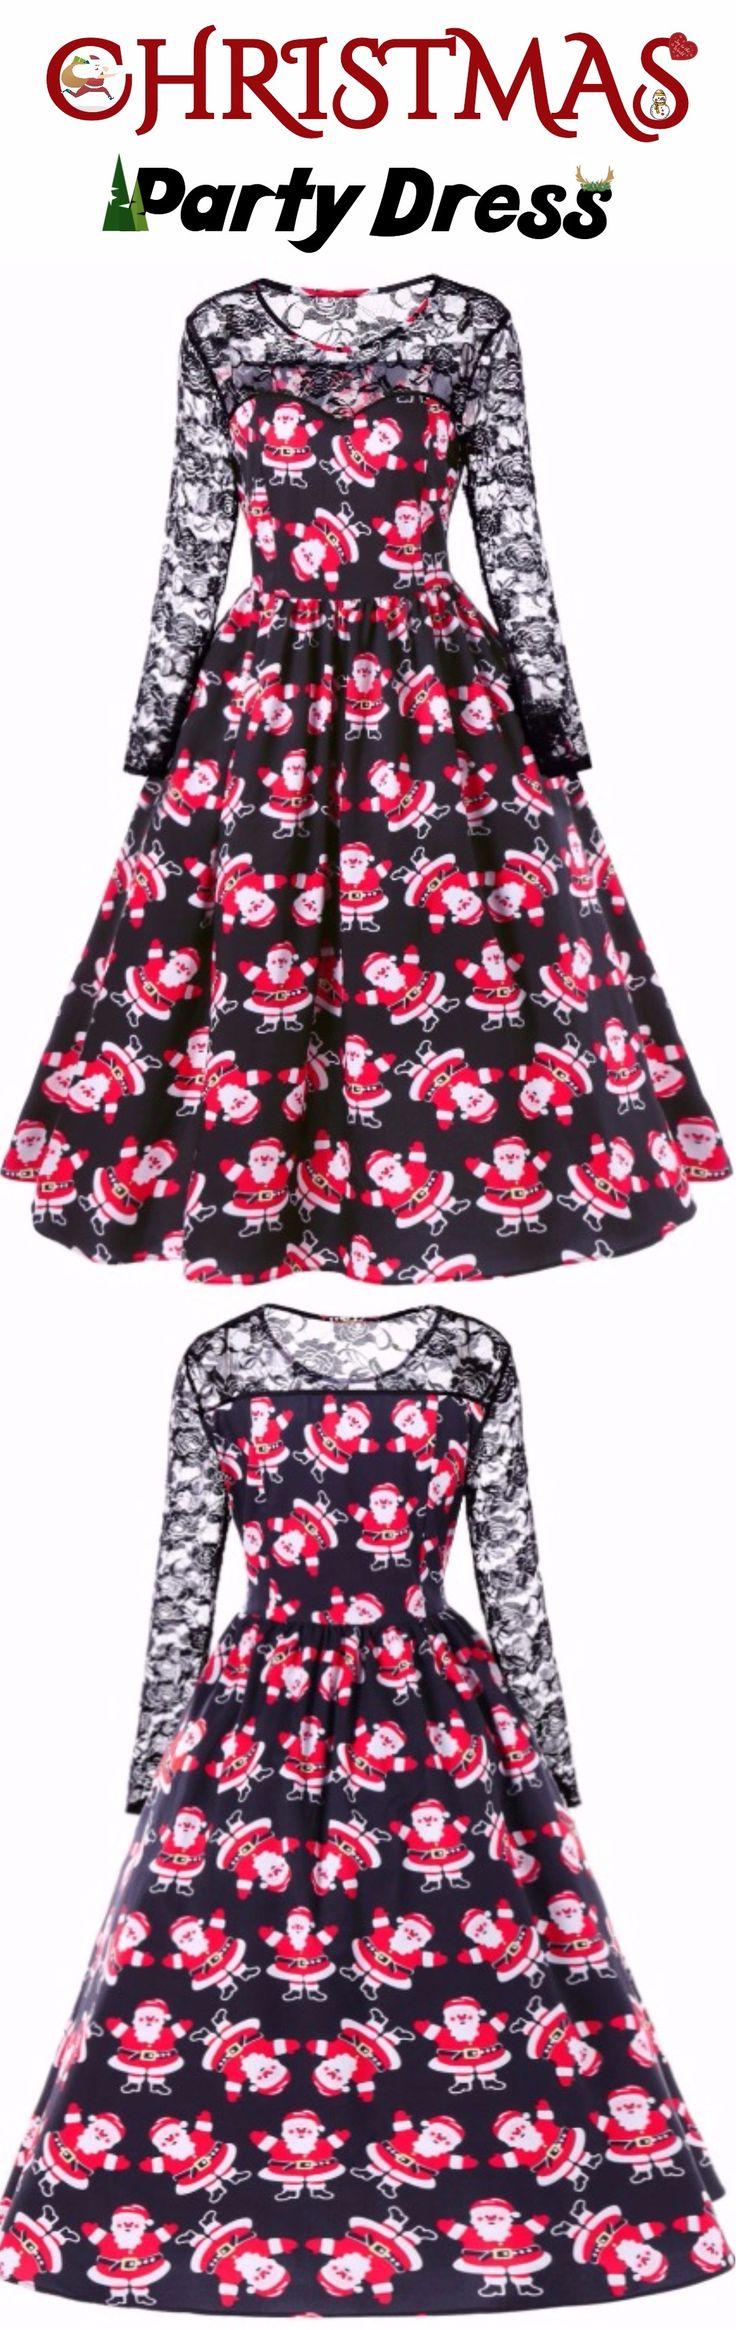 Christmas Party Dress | Only $15.51 | Father Christmas Print Lace Panel Dress| Sammydress.com